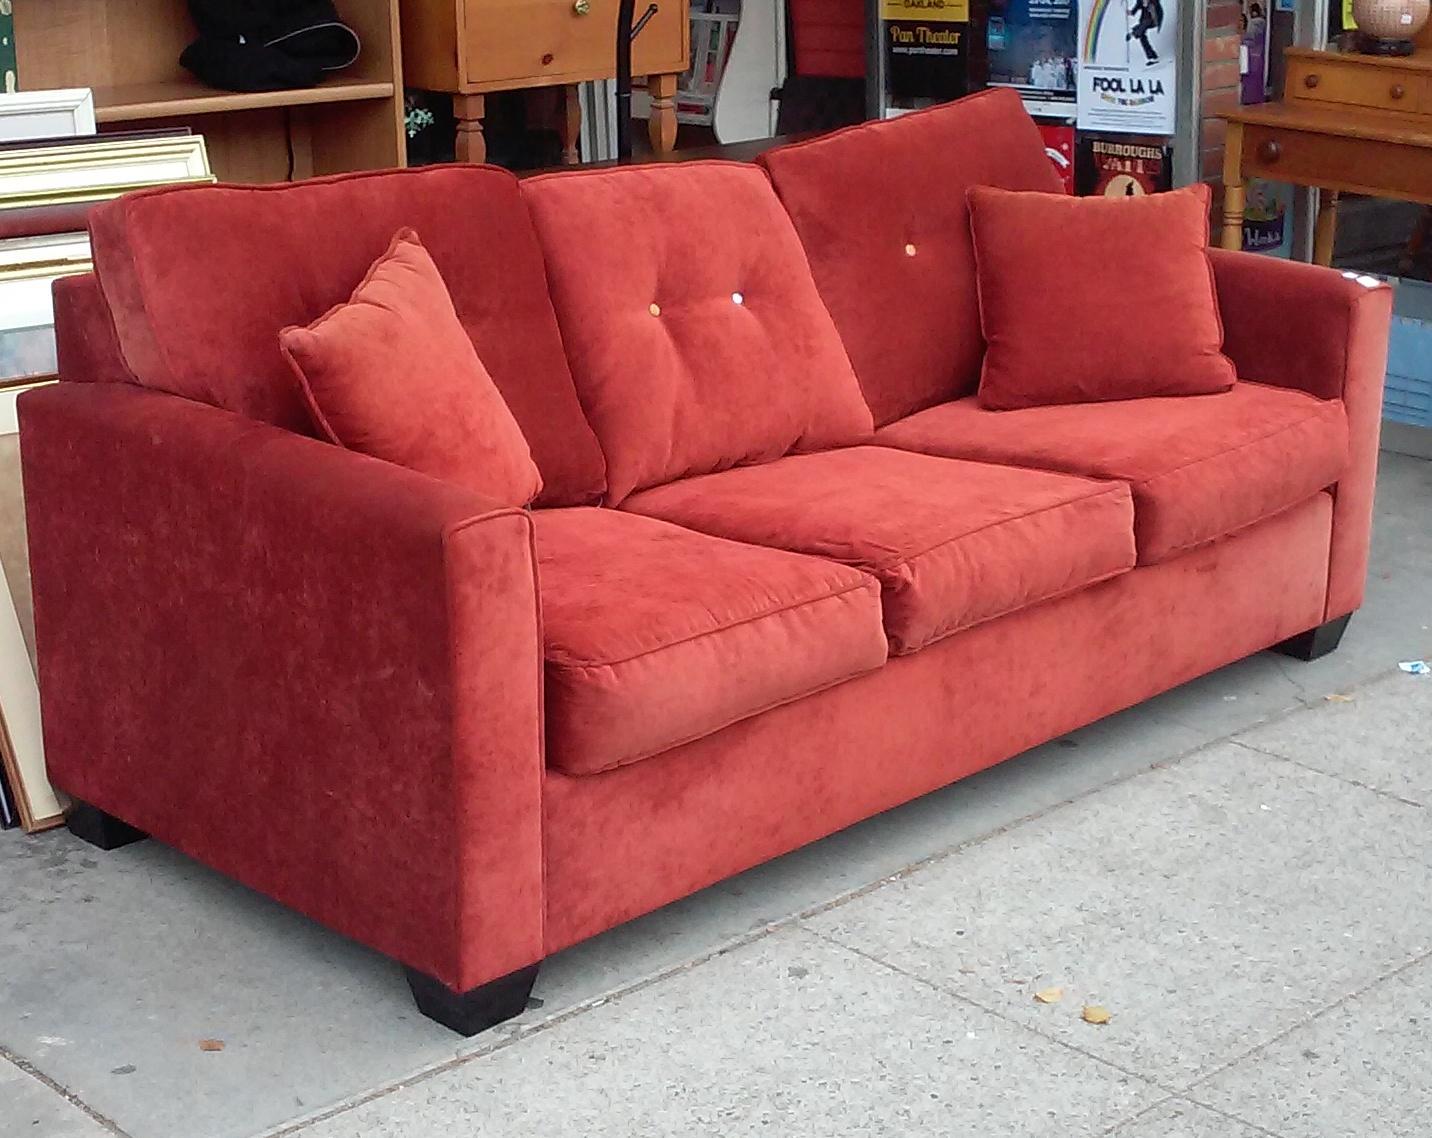 orange sofa bed green swivel chair uhuru furniture and collectibles bargain buy 9384